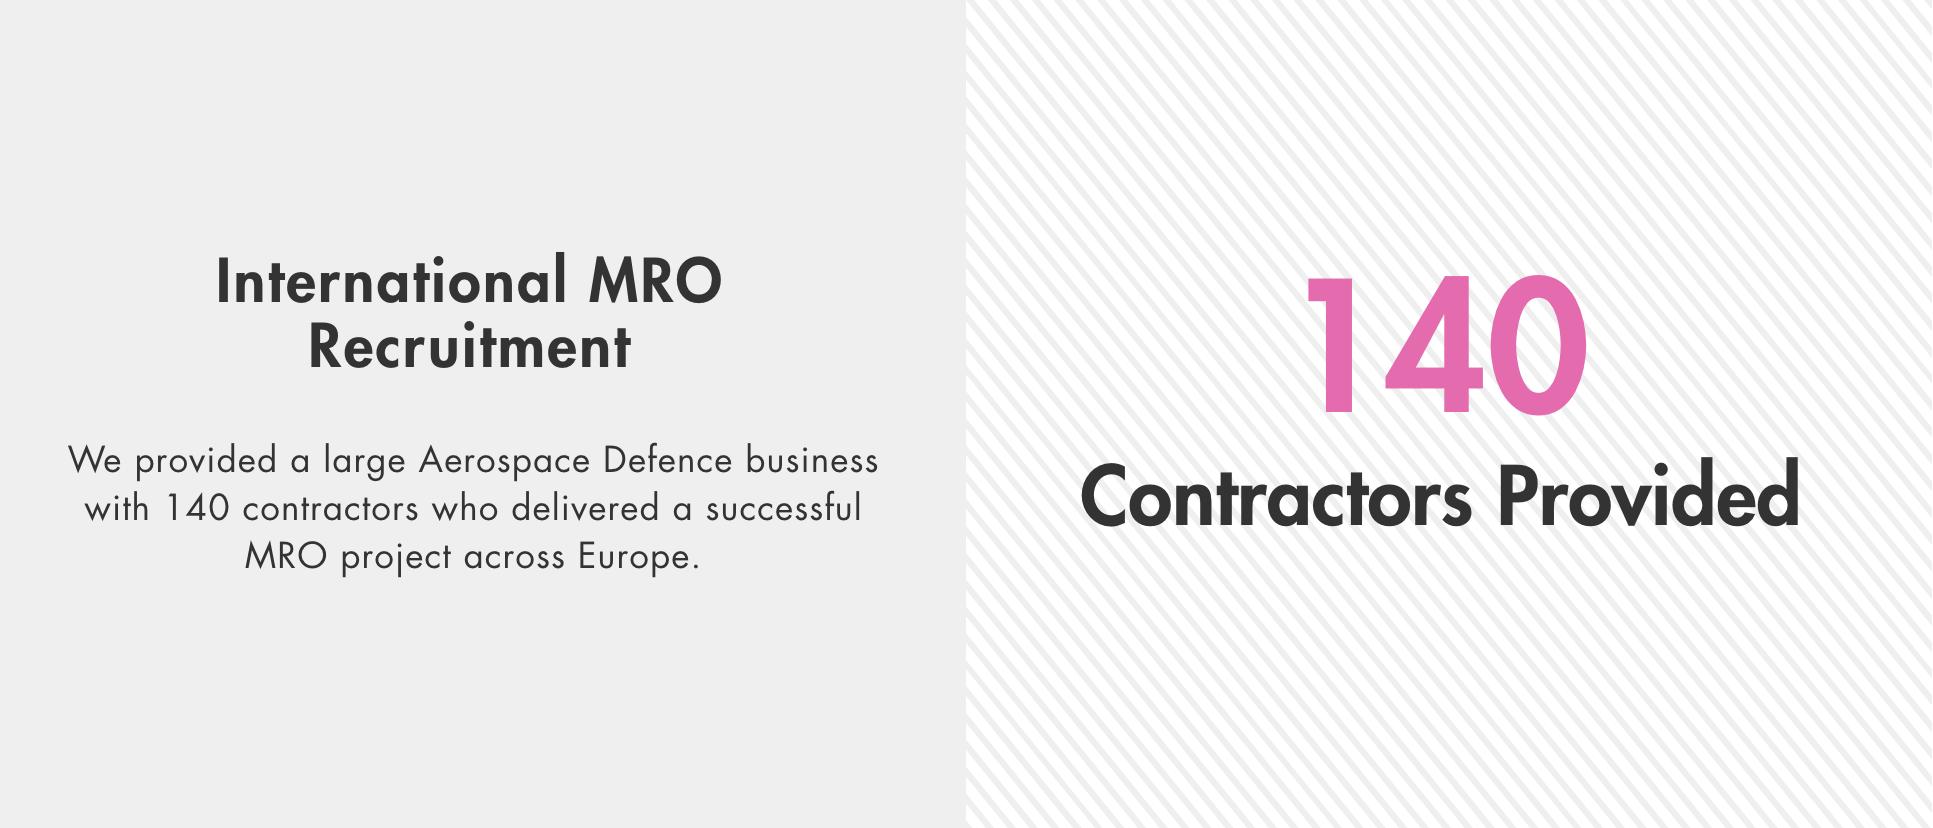 International MRO Recruitment Project